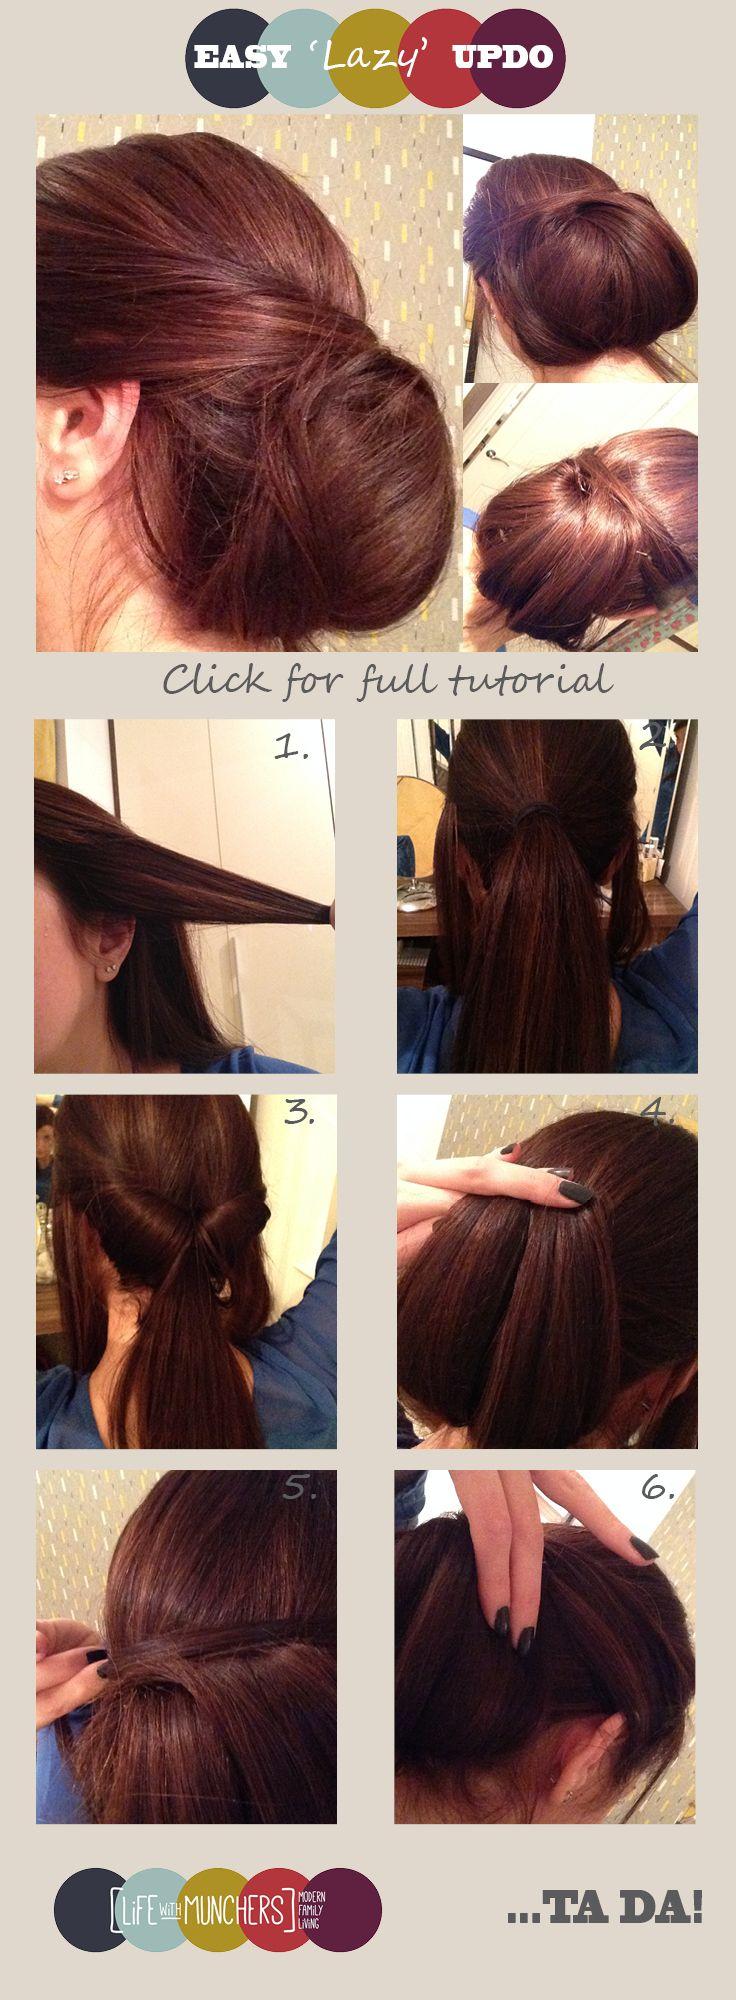 Easy Updo for Long Hair Tutorial | Cheats Chignon Tutorial